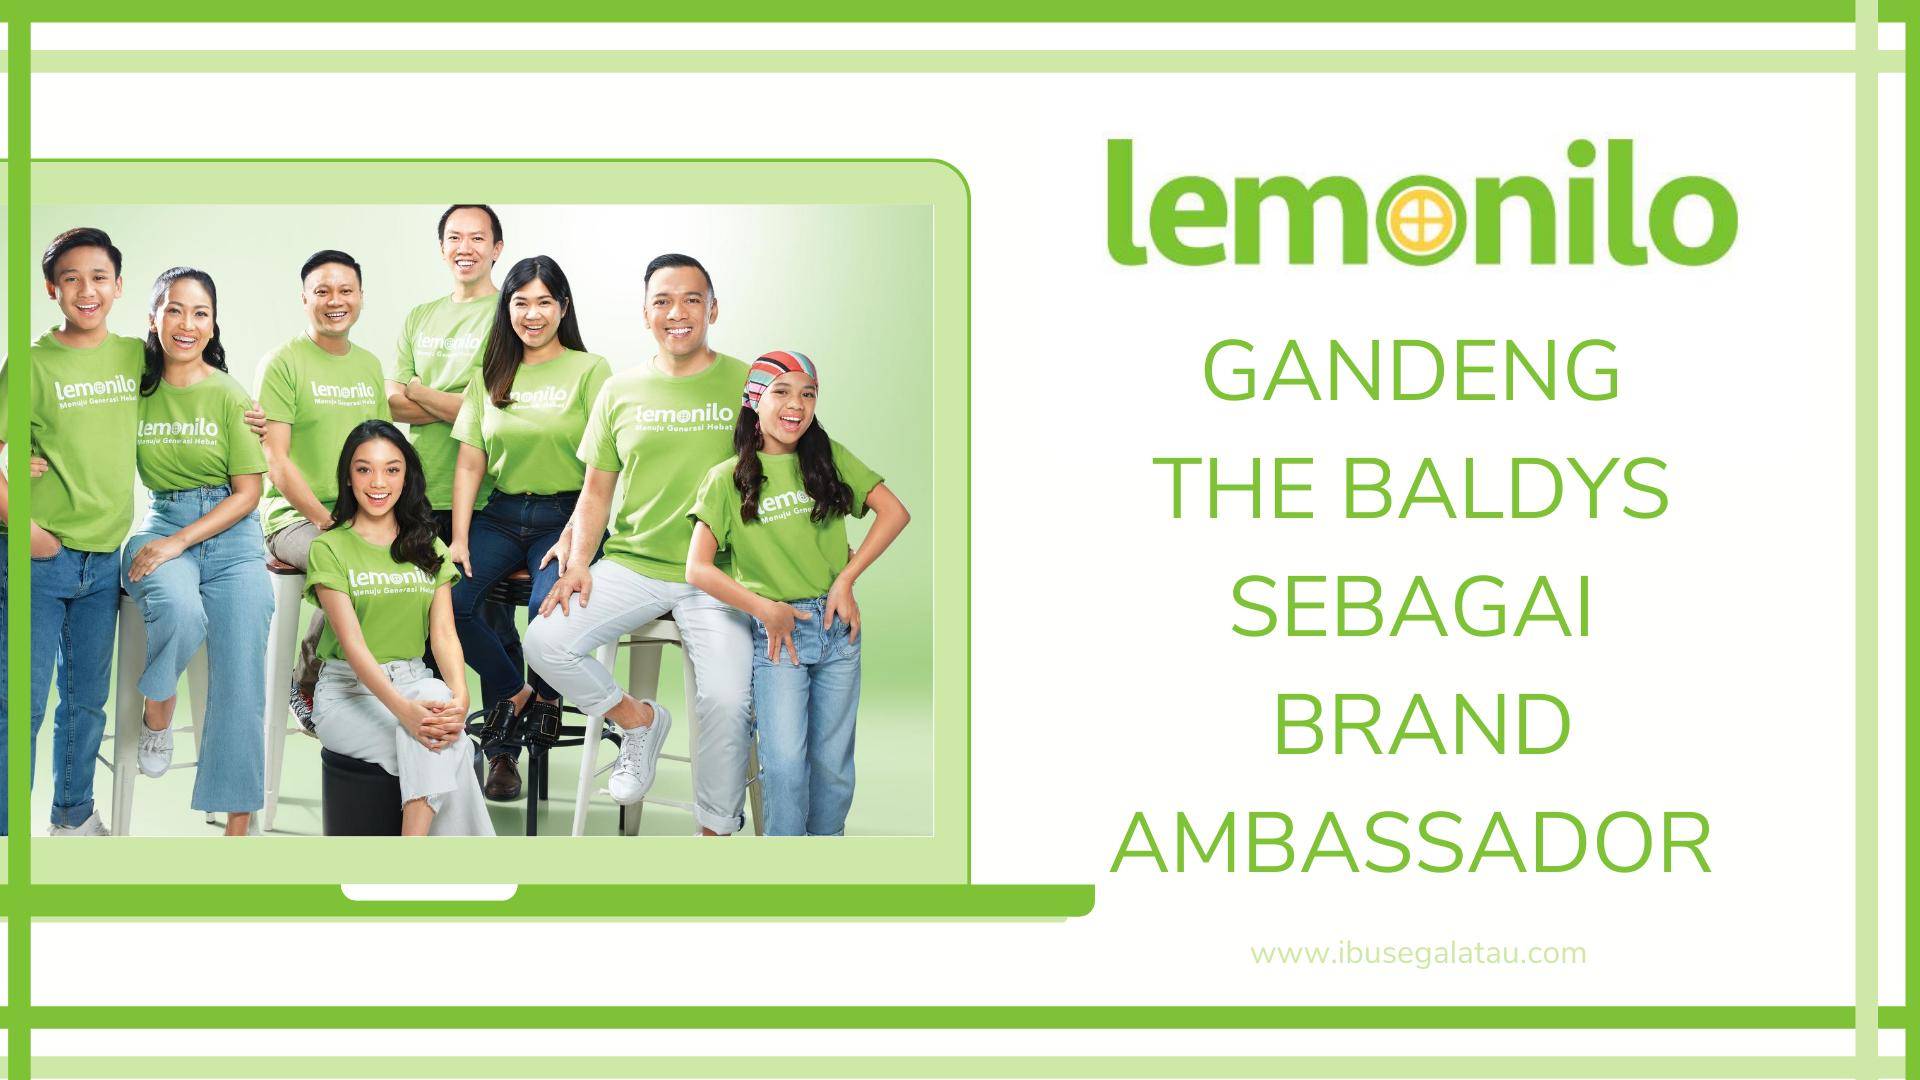 Lemonilo Gandeng The Baldys sebagai Brand Ambassador